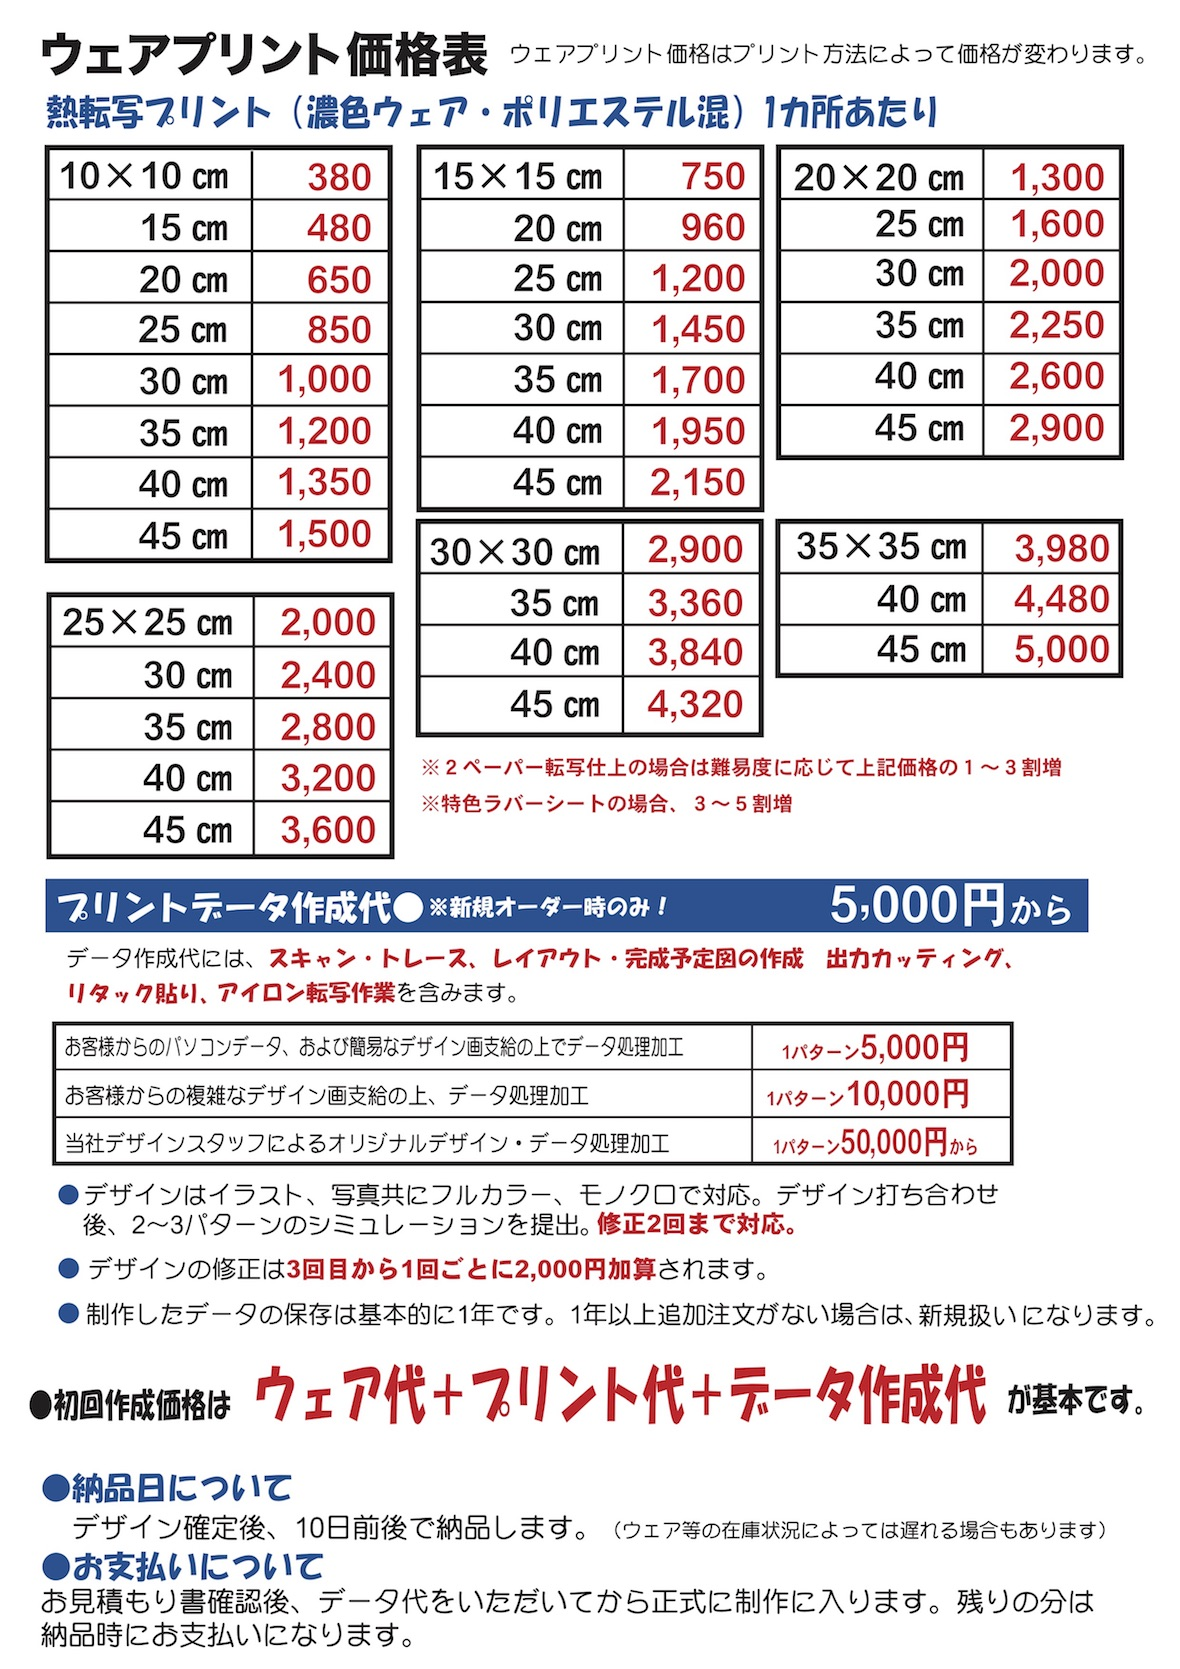 h290526改_熱転写ウェア価格表